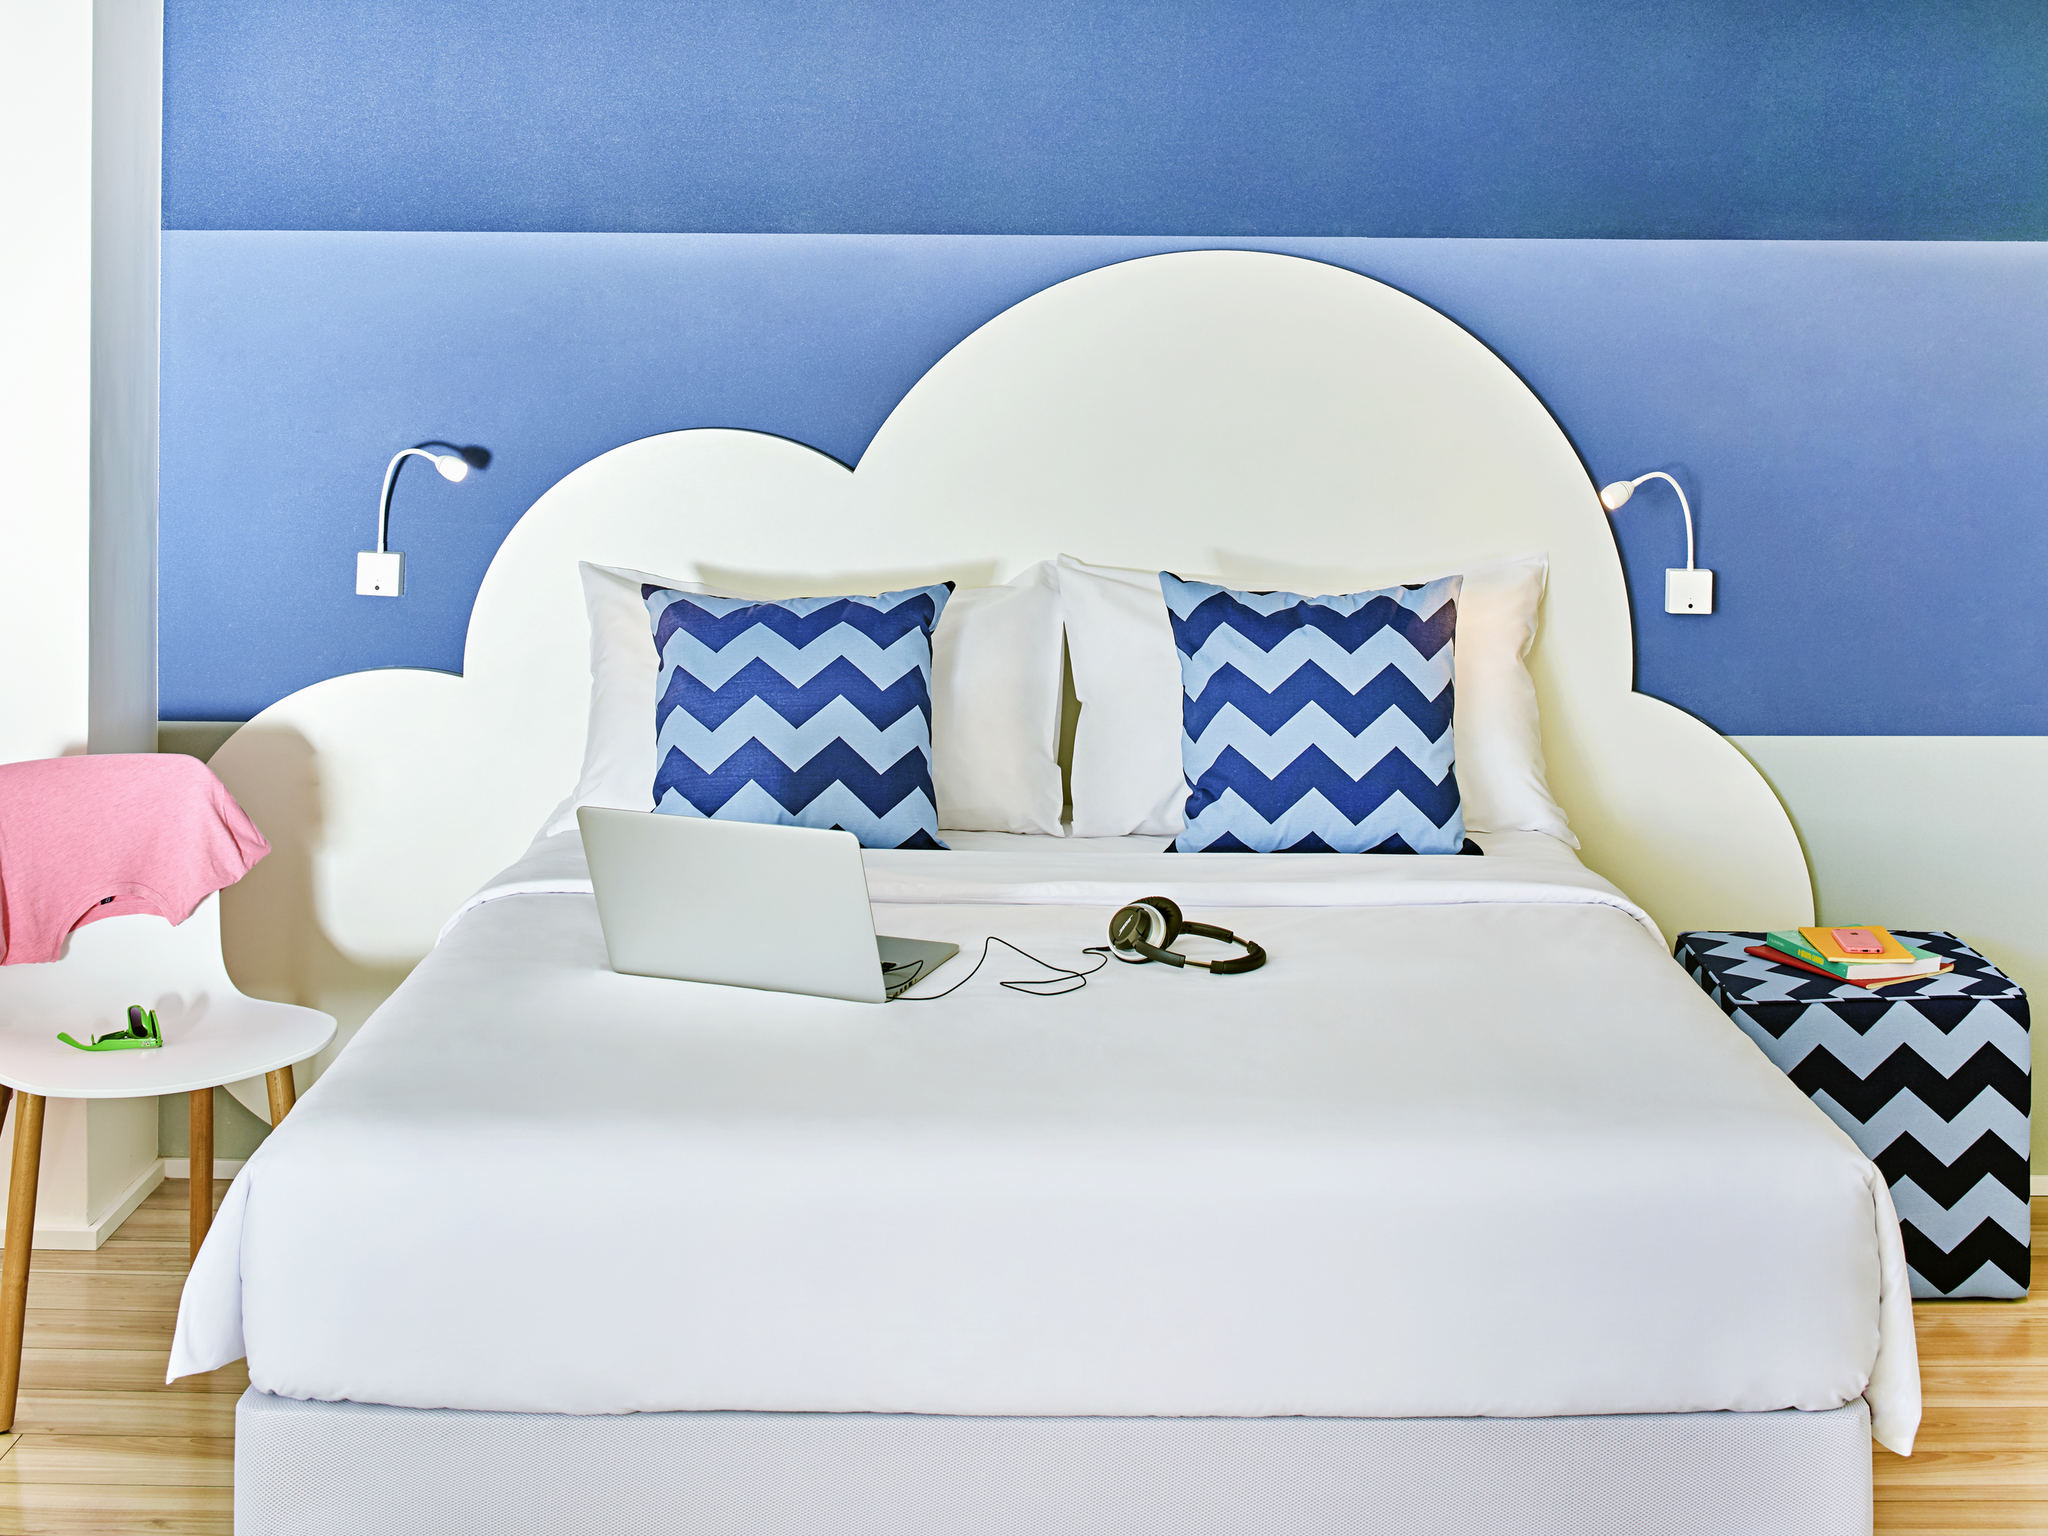 Hotel in sao paulo ibis styles sao paulo anhembi for Style hotel